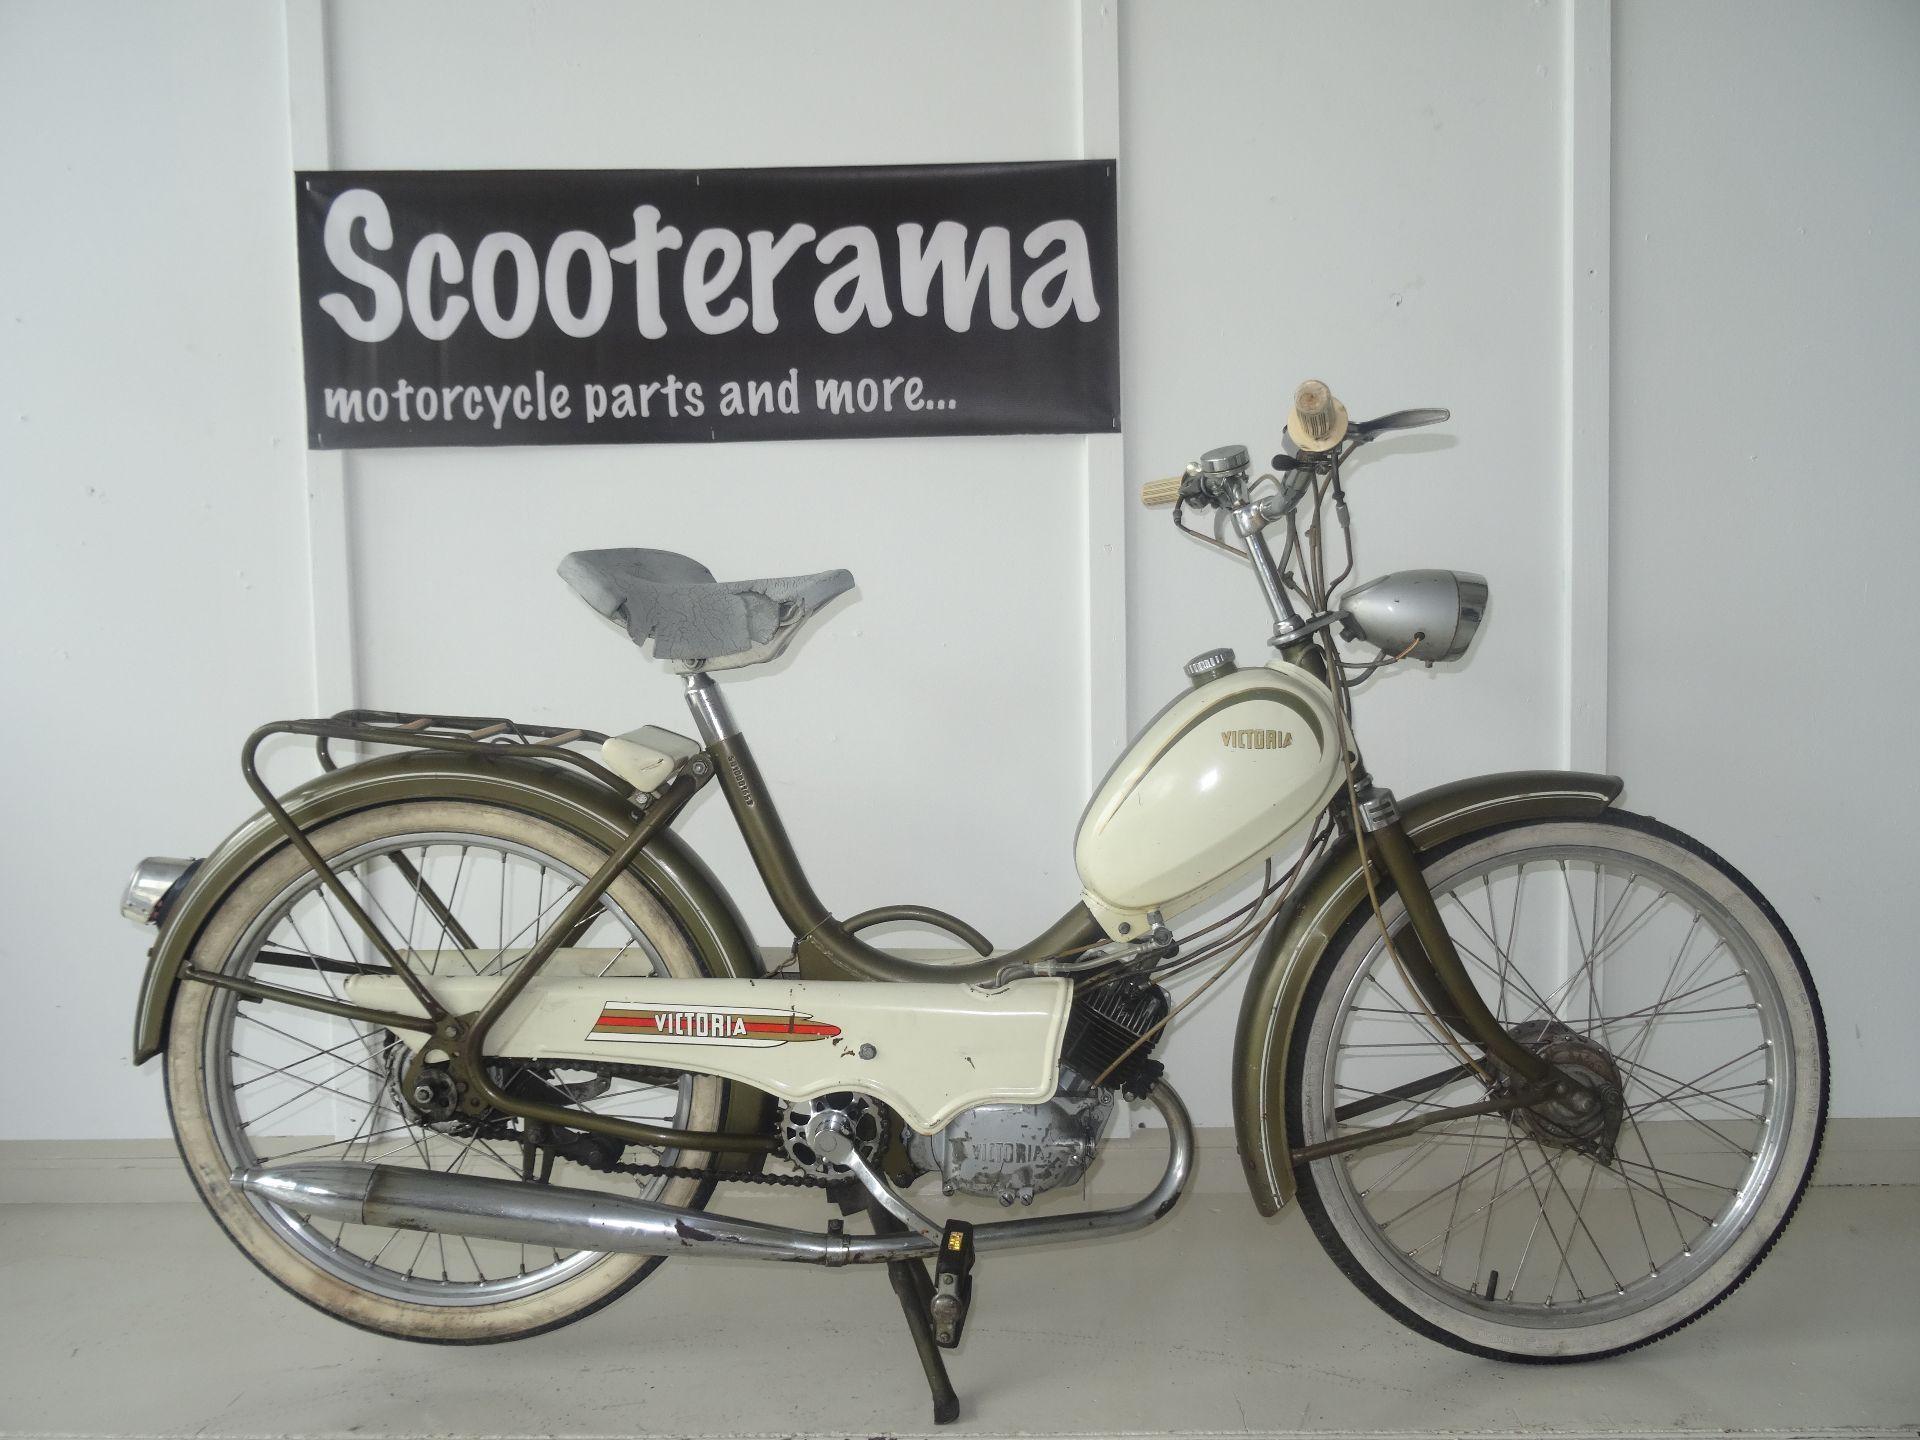 motorrad occasion kaufen victoria mofa scooterama gmbh herzogenbuchsee. Black Bedroom Furniture Sets. Home Design Ideas